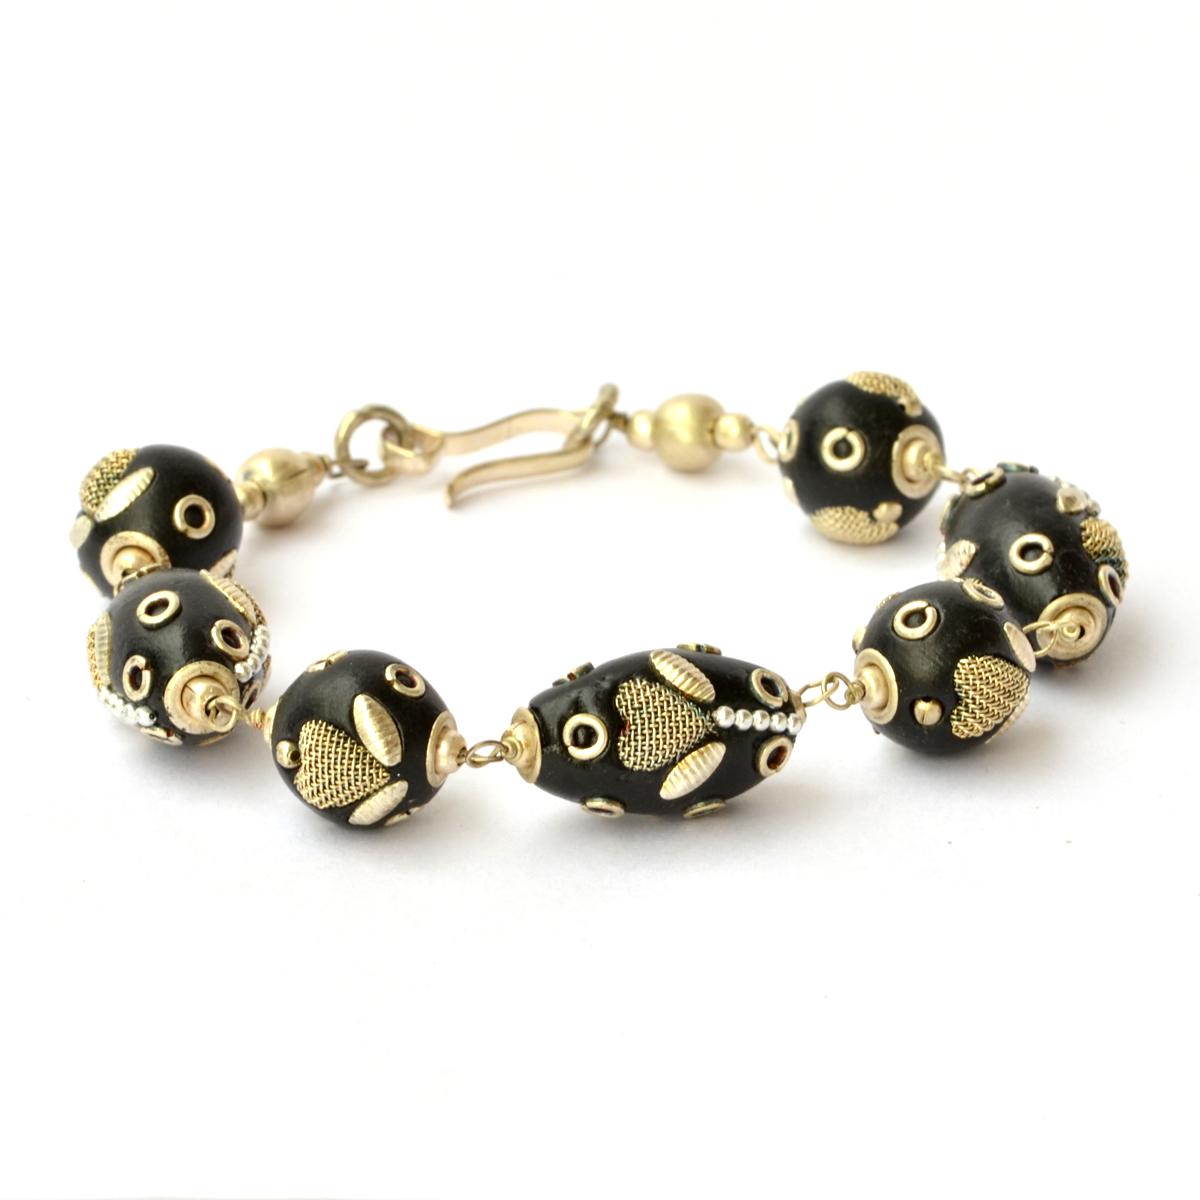 handmade bracelet black studded with metal